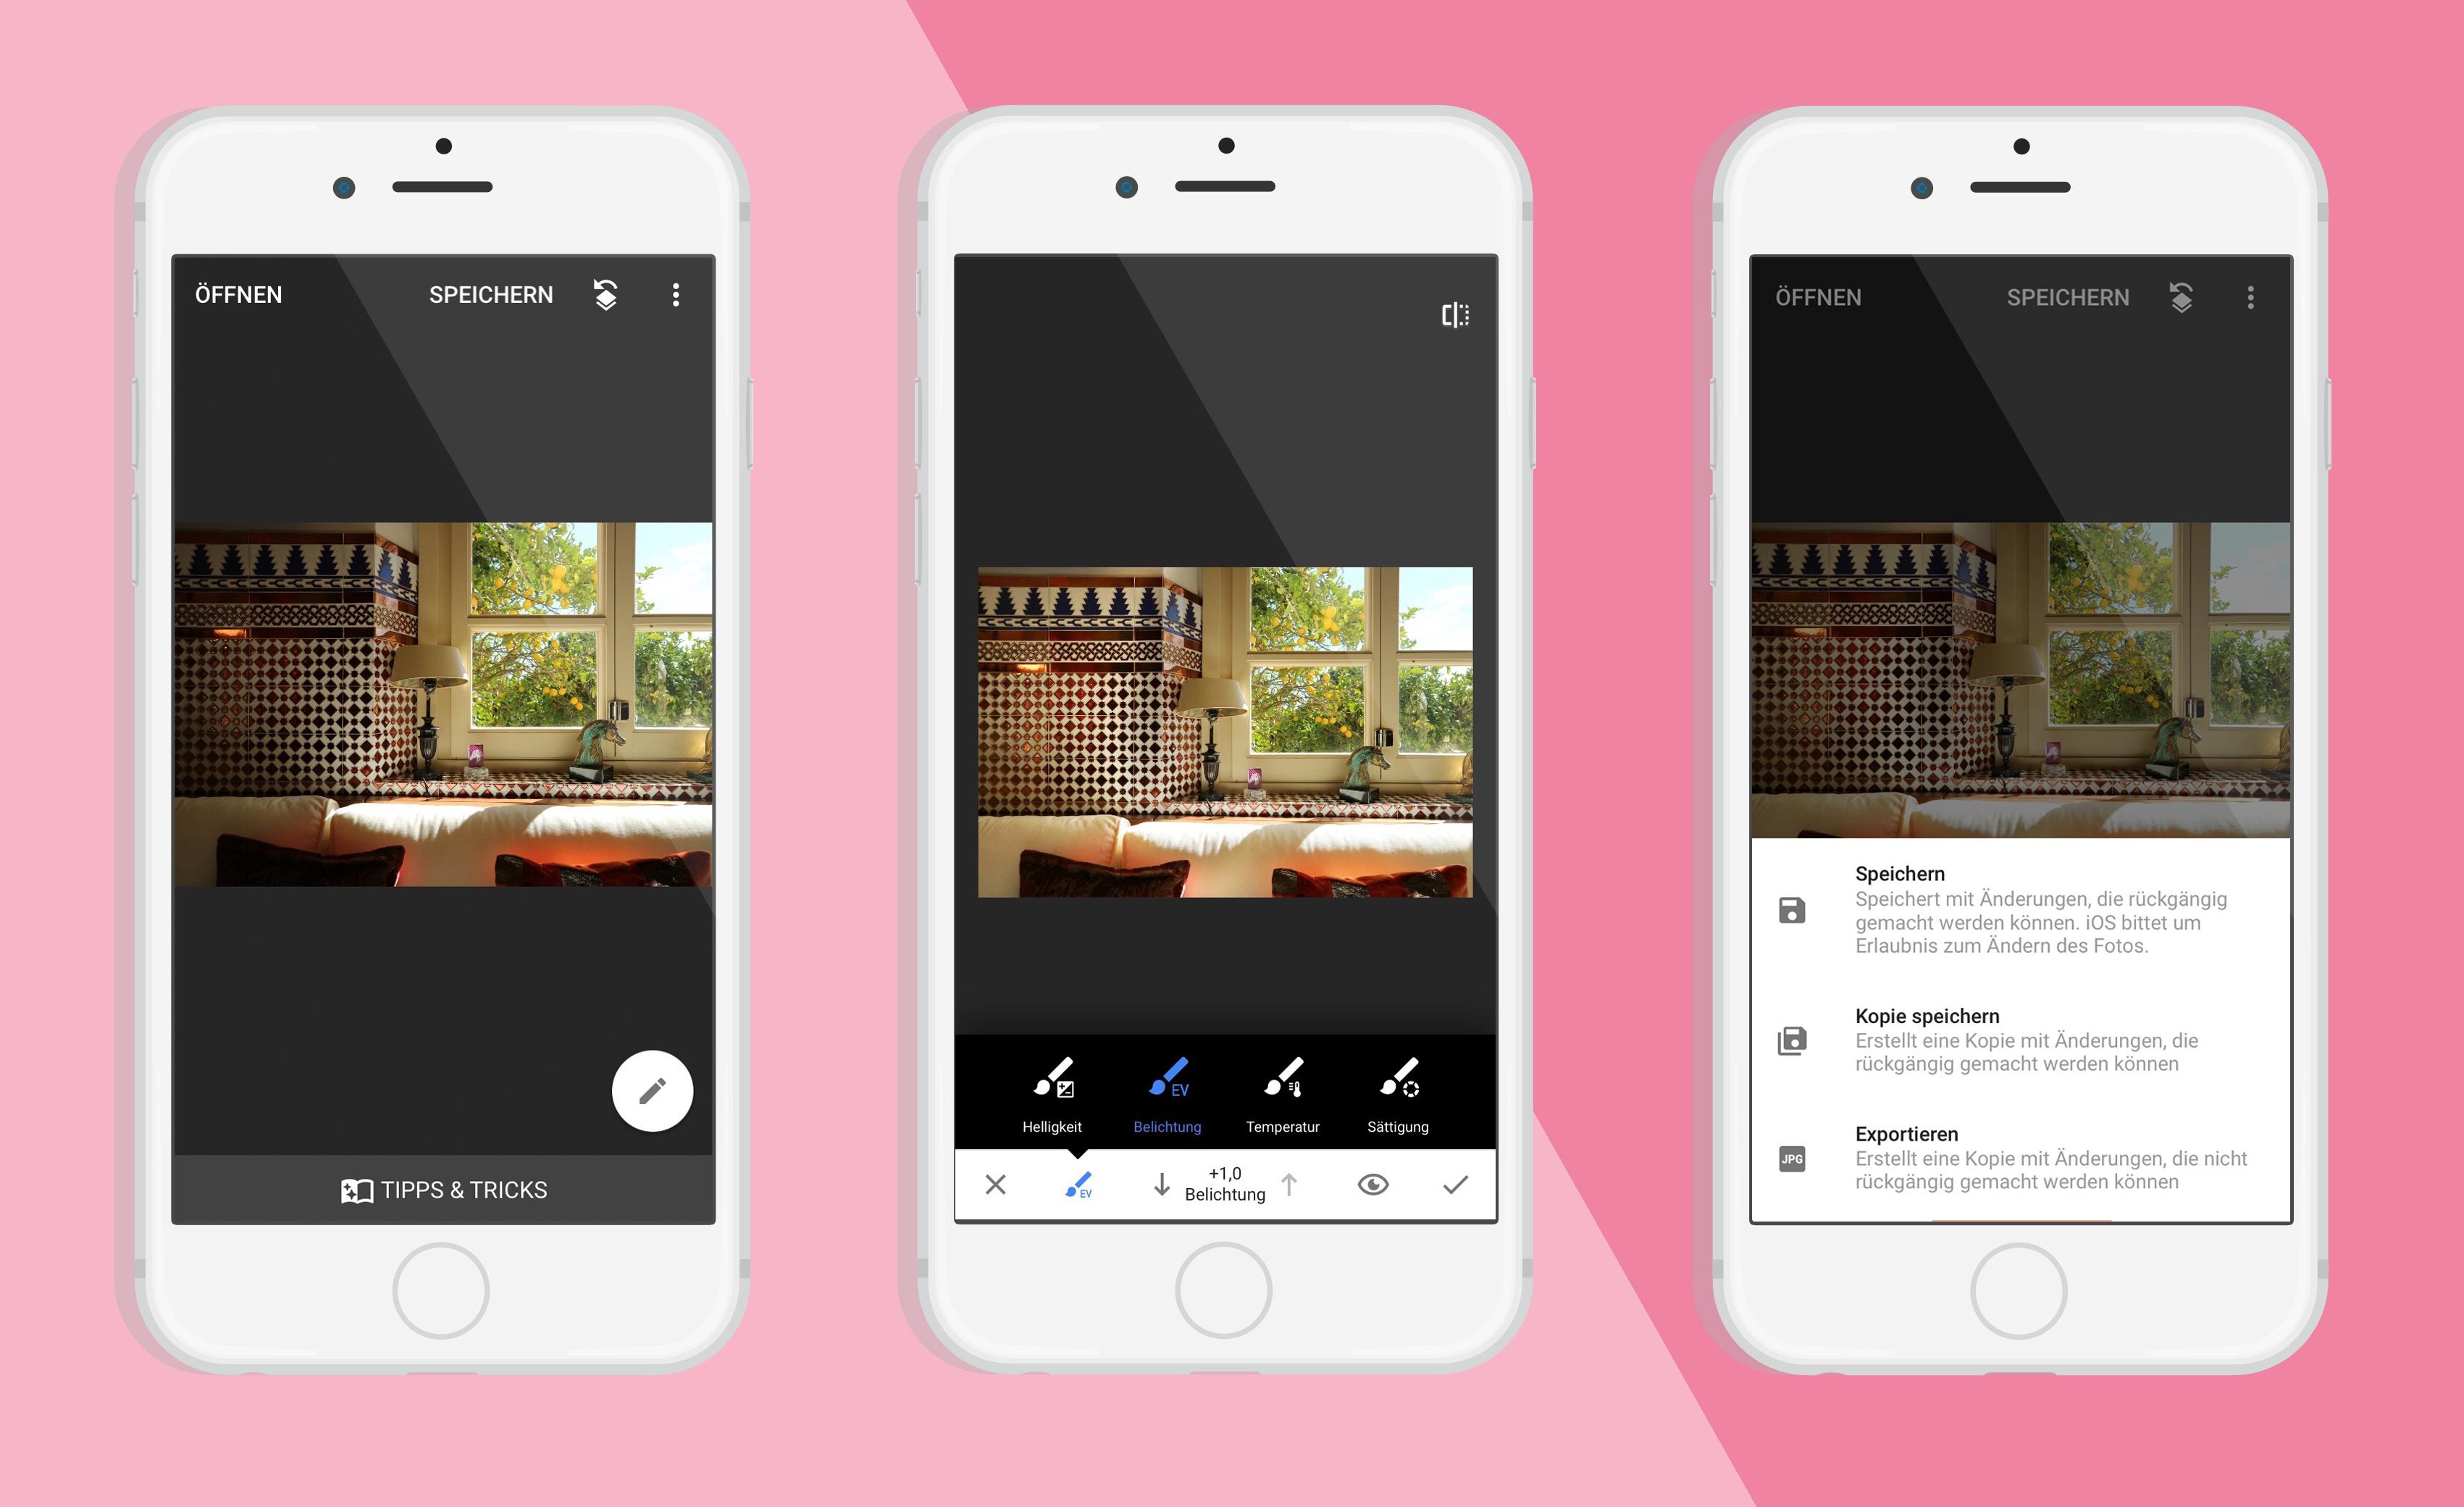 app-bilder-teilweise-aufhellen-bildbearbeitung